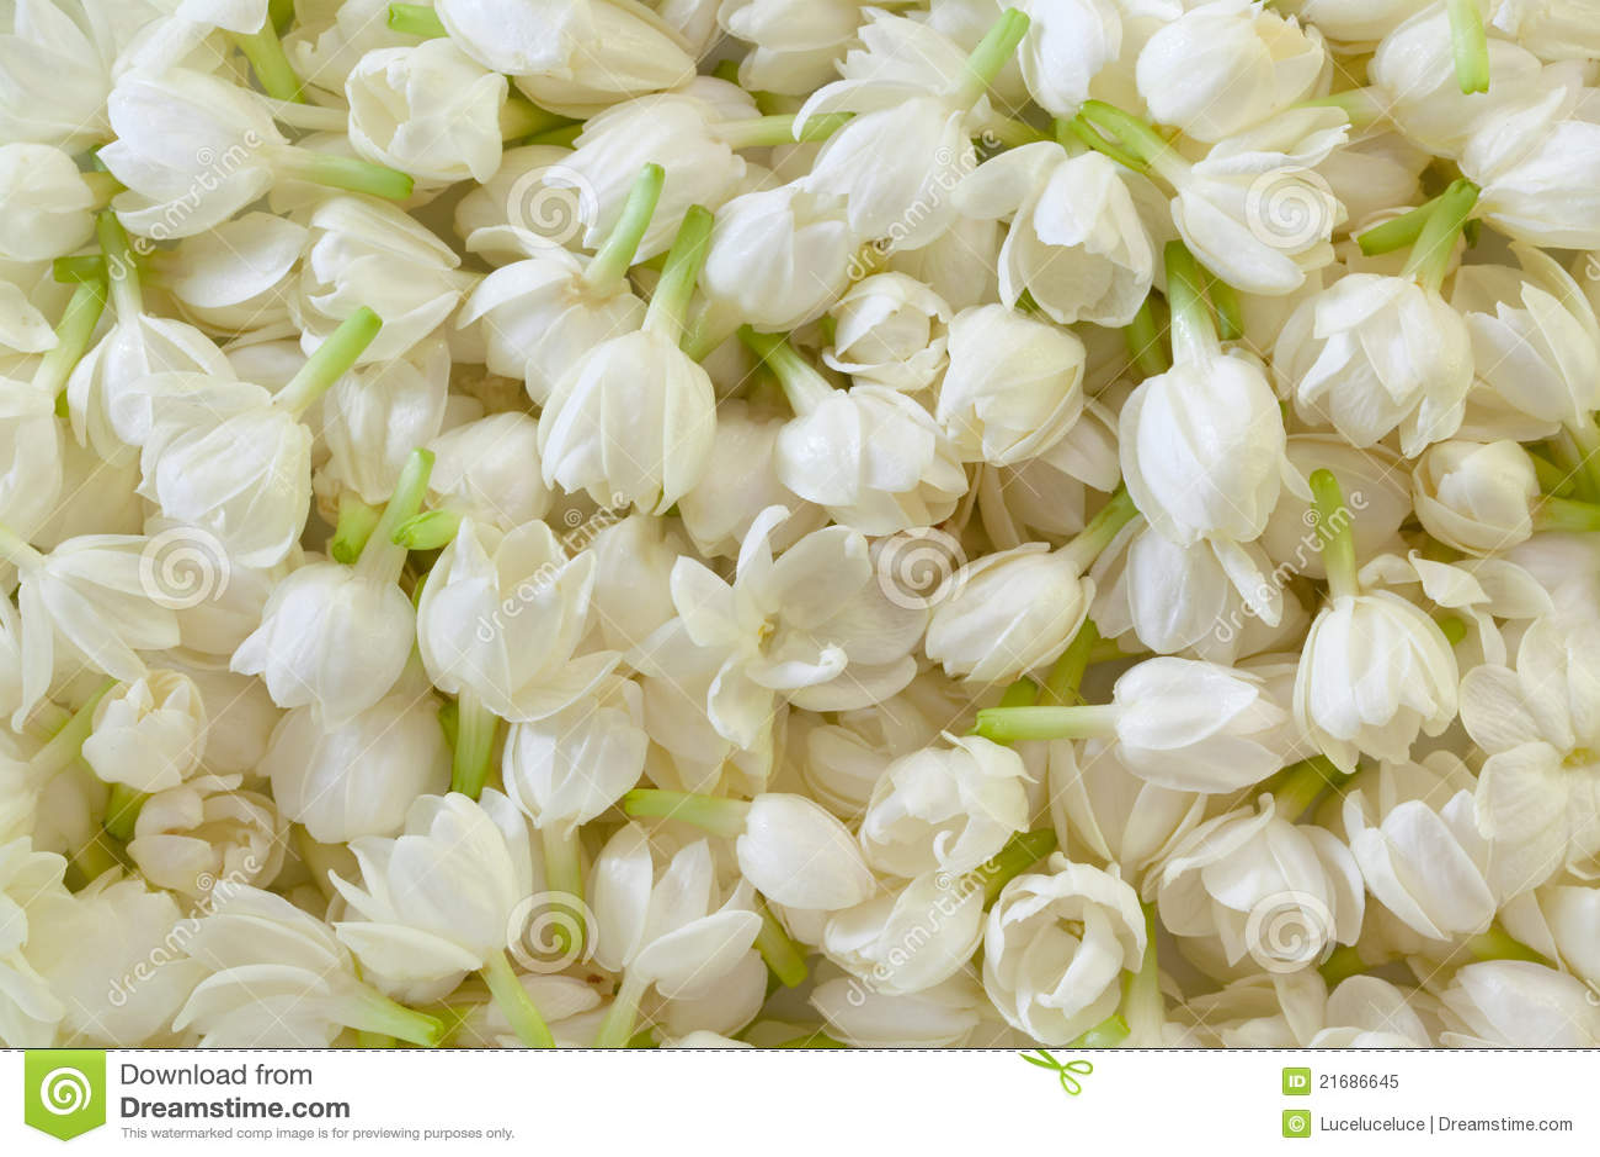 Fresh jasmine flower background stock illustration illustration of fresh jasmine flower background izmirmasajfo Gallery